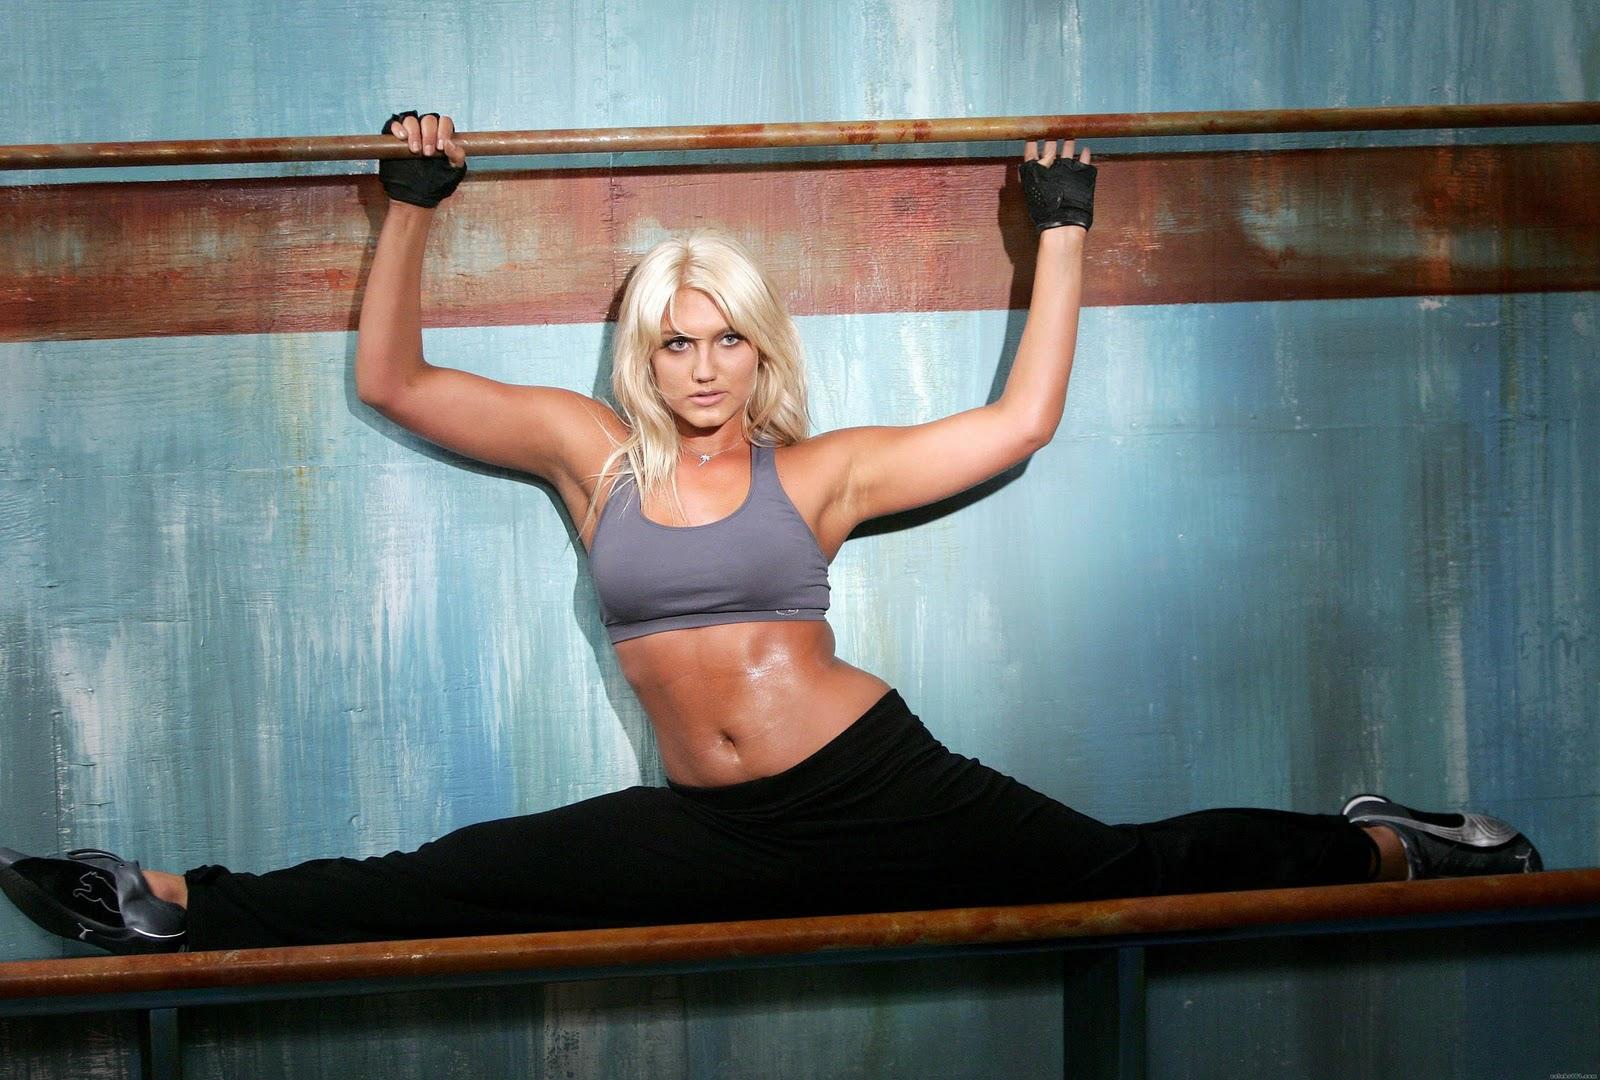 http://1.bp.blogspot.com/-zCT5QCJtnWk/TpVo2aVTgqI/AAAAAAAAFPc/VMKvJpMMdJ8/s1600/Brooke_Hogan+Photos+22.jpg